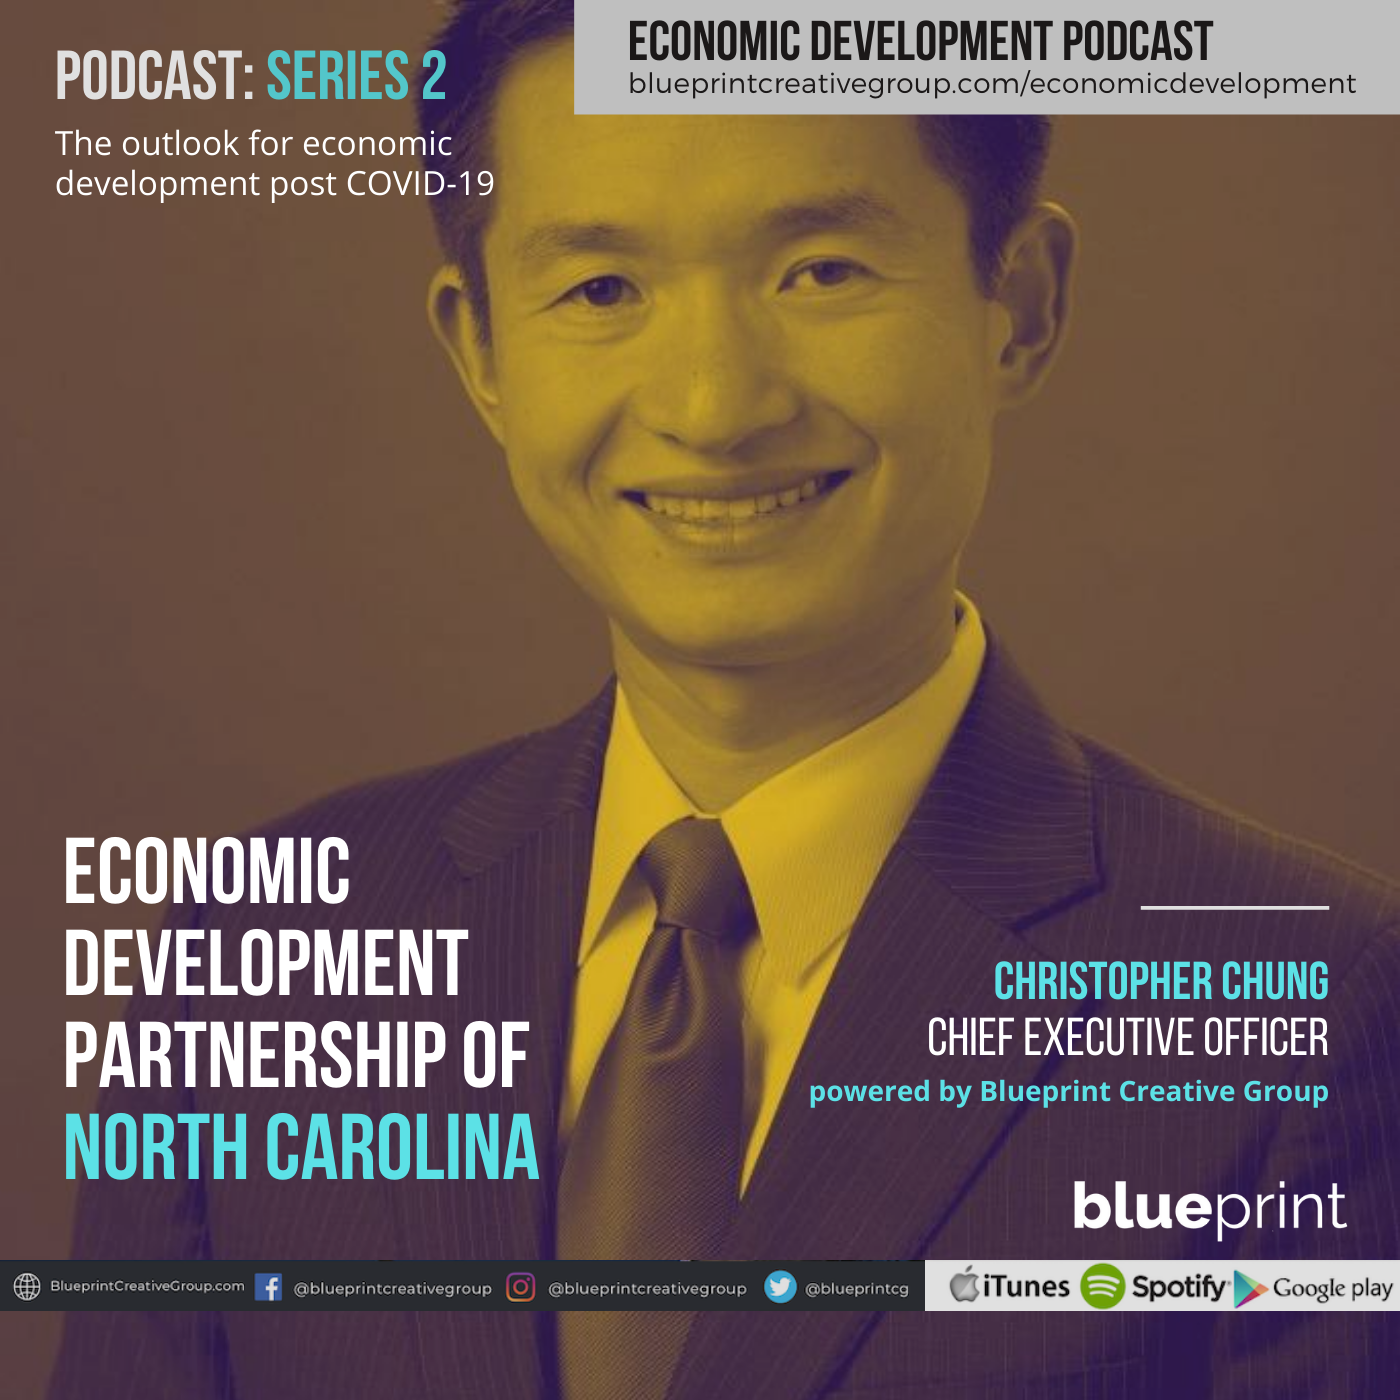 Chris Chung, Economic Development Partnership of North Carolina